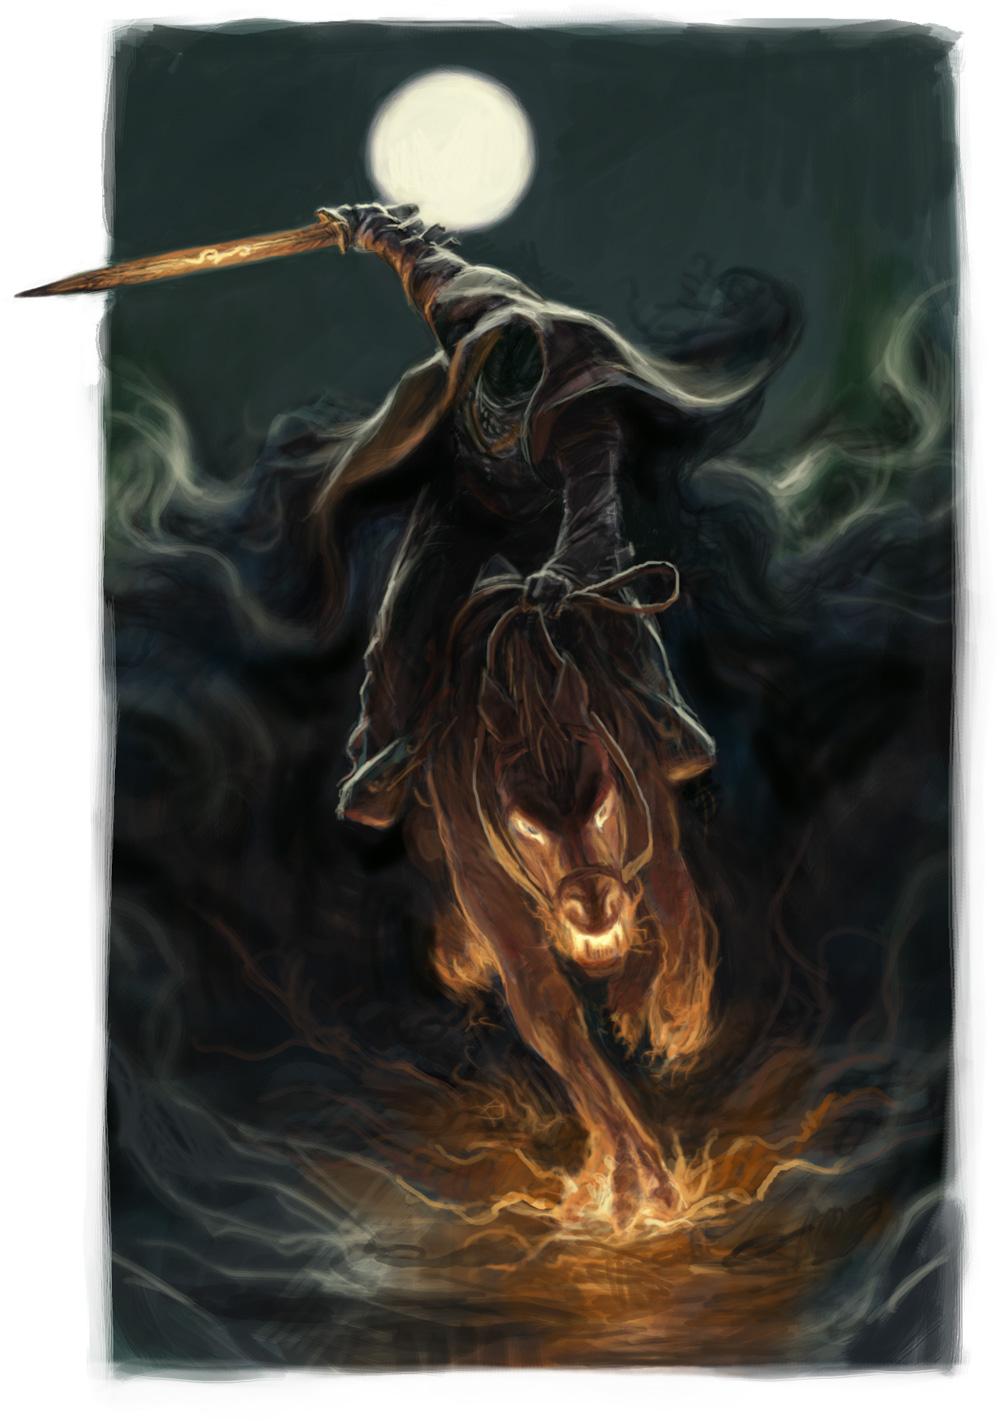 Celtic pumpkin ghost spotlight the headless horseman of sleepy hollow - Pictures of the headless horseman ...